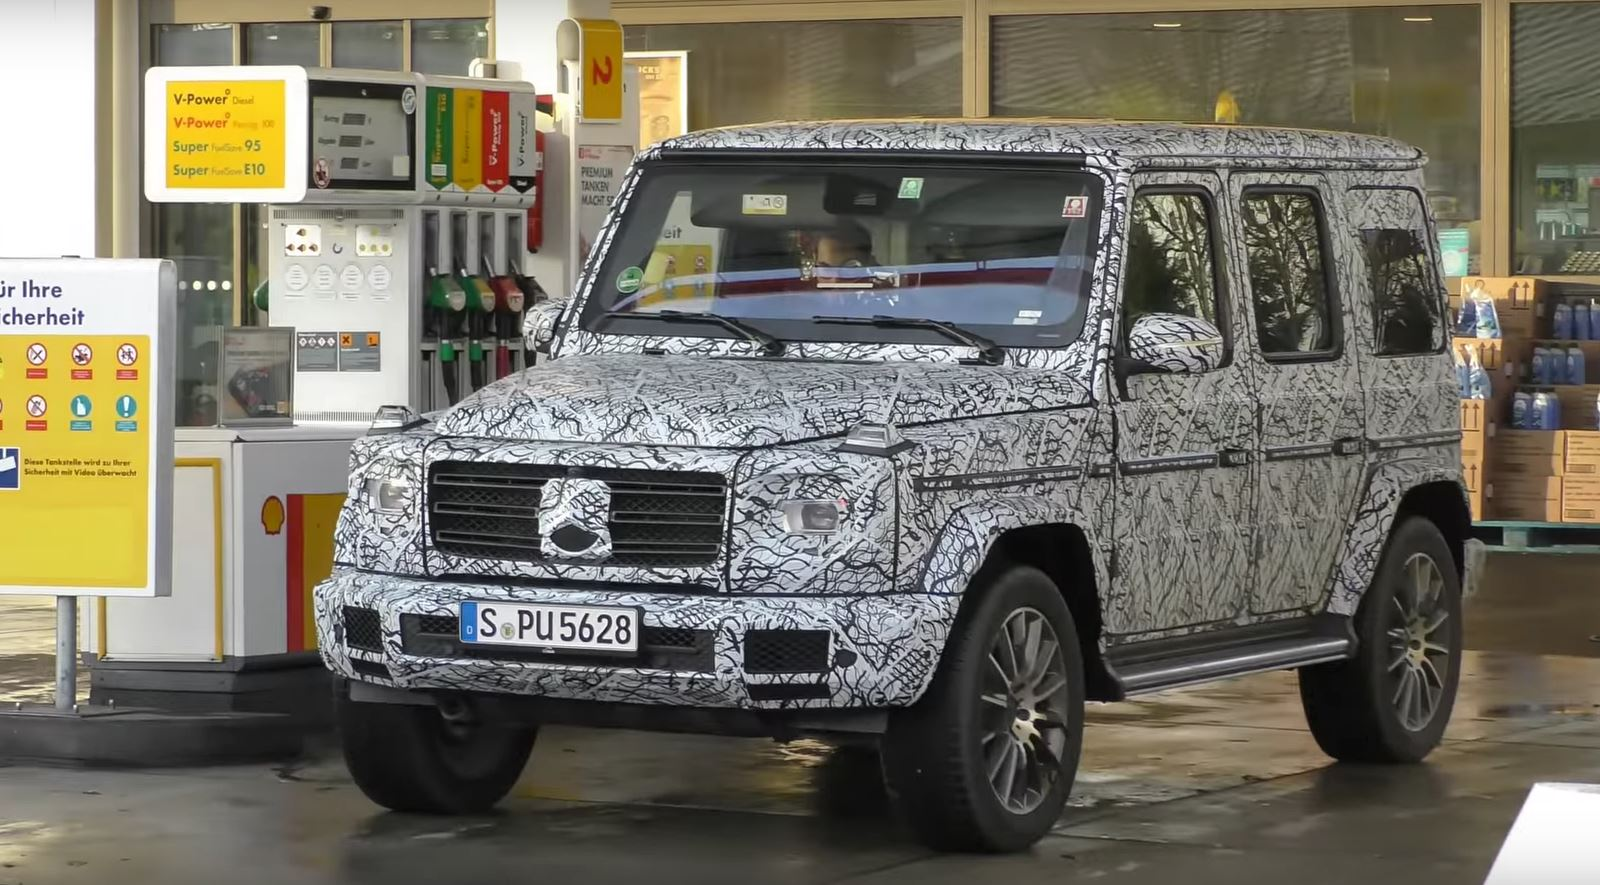 First MillionDollar MercedesBenz GClass Is Armored Autoevolution - 1 million mercedes coolest armoured vehicle ever